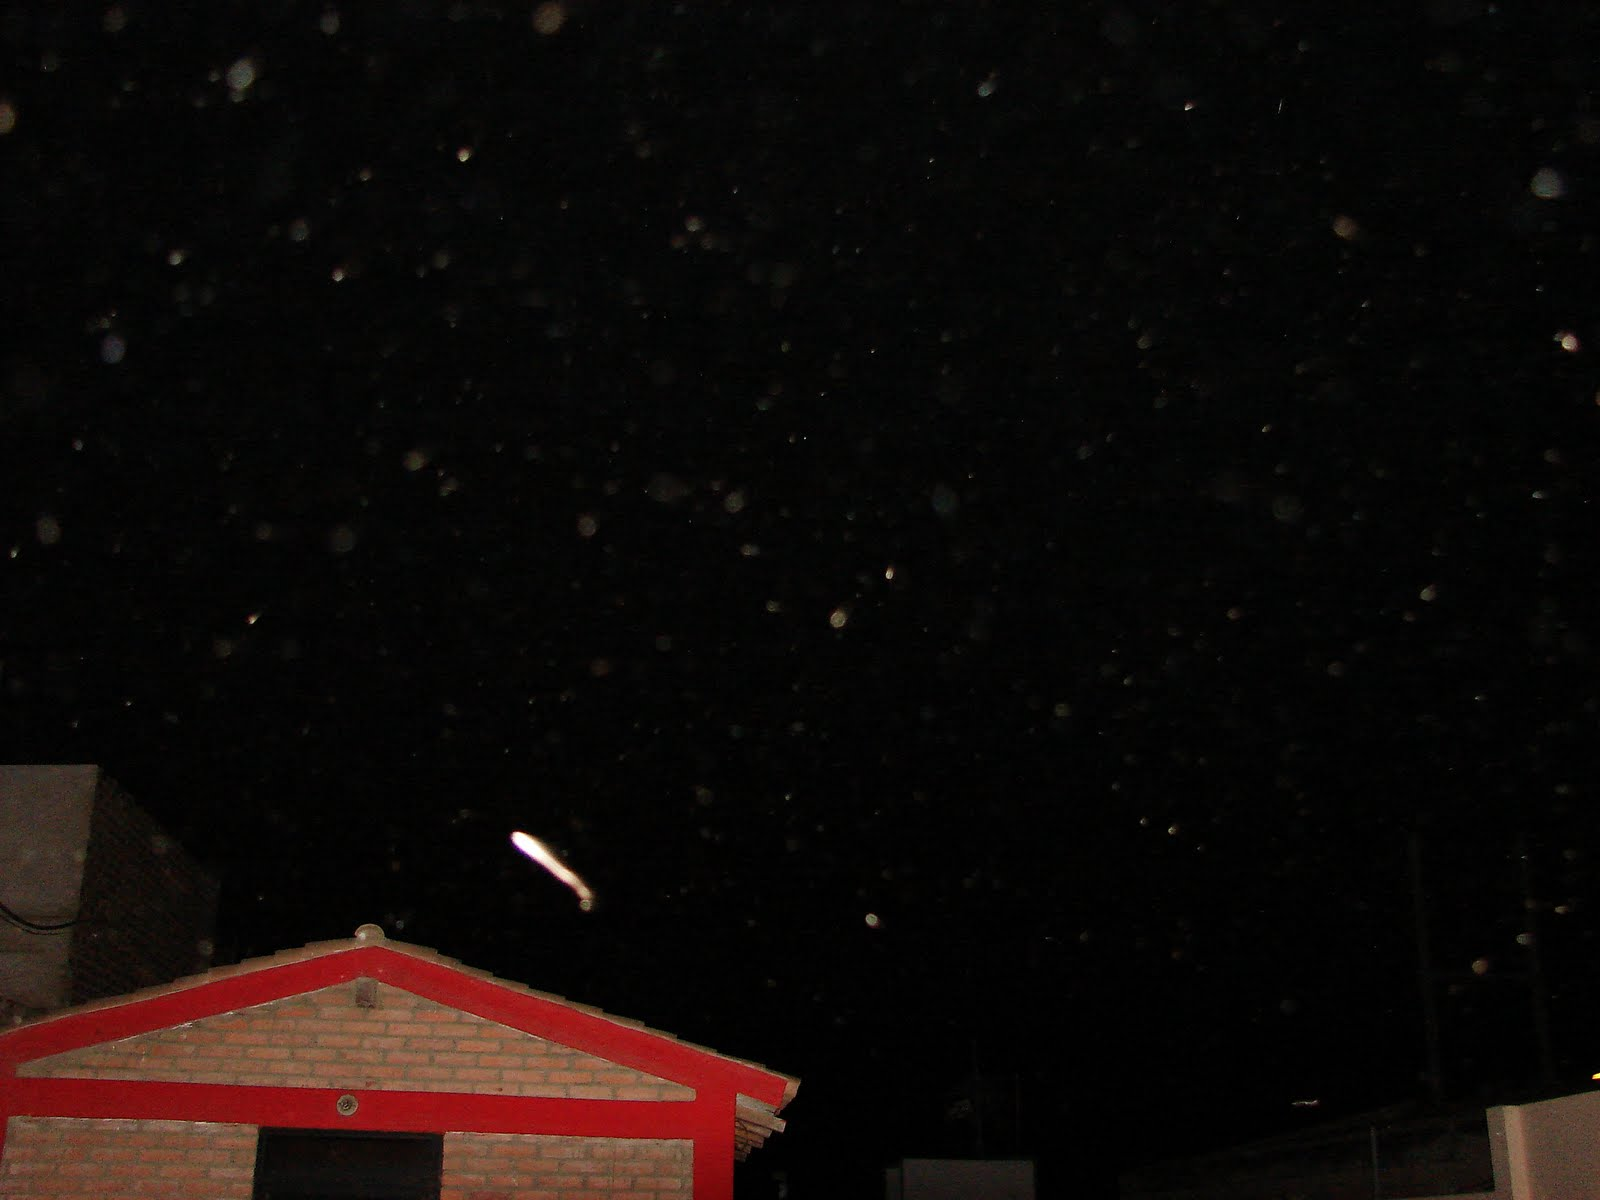 ATENCION.5-SEPTIEMBRE-6-7.8-0-10..2011 super avistamientos Ovni inmenso largo...sec ufo....